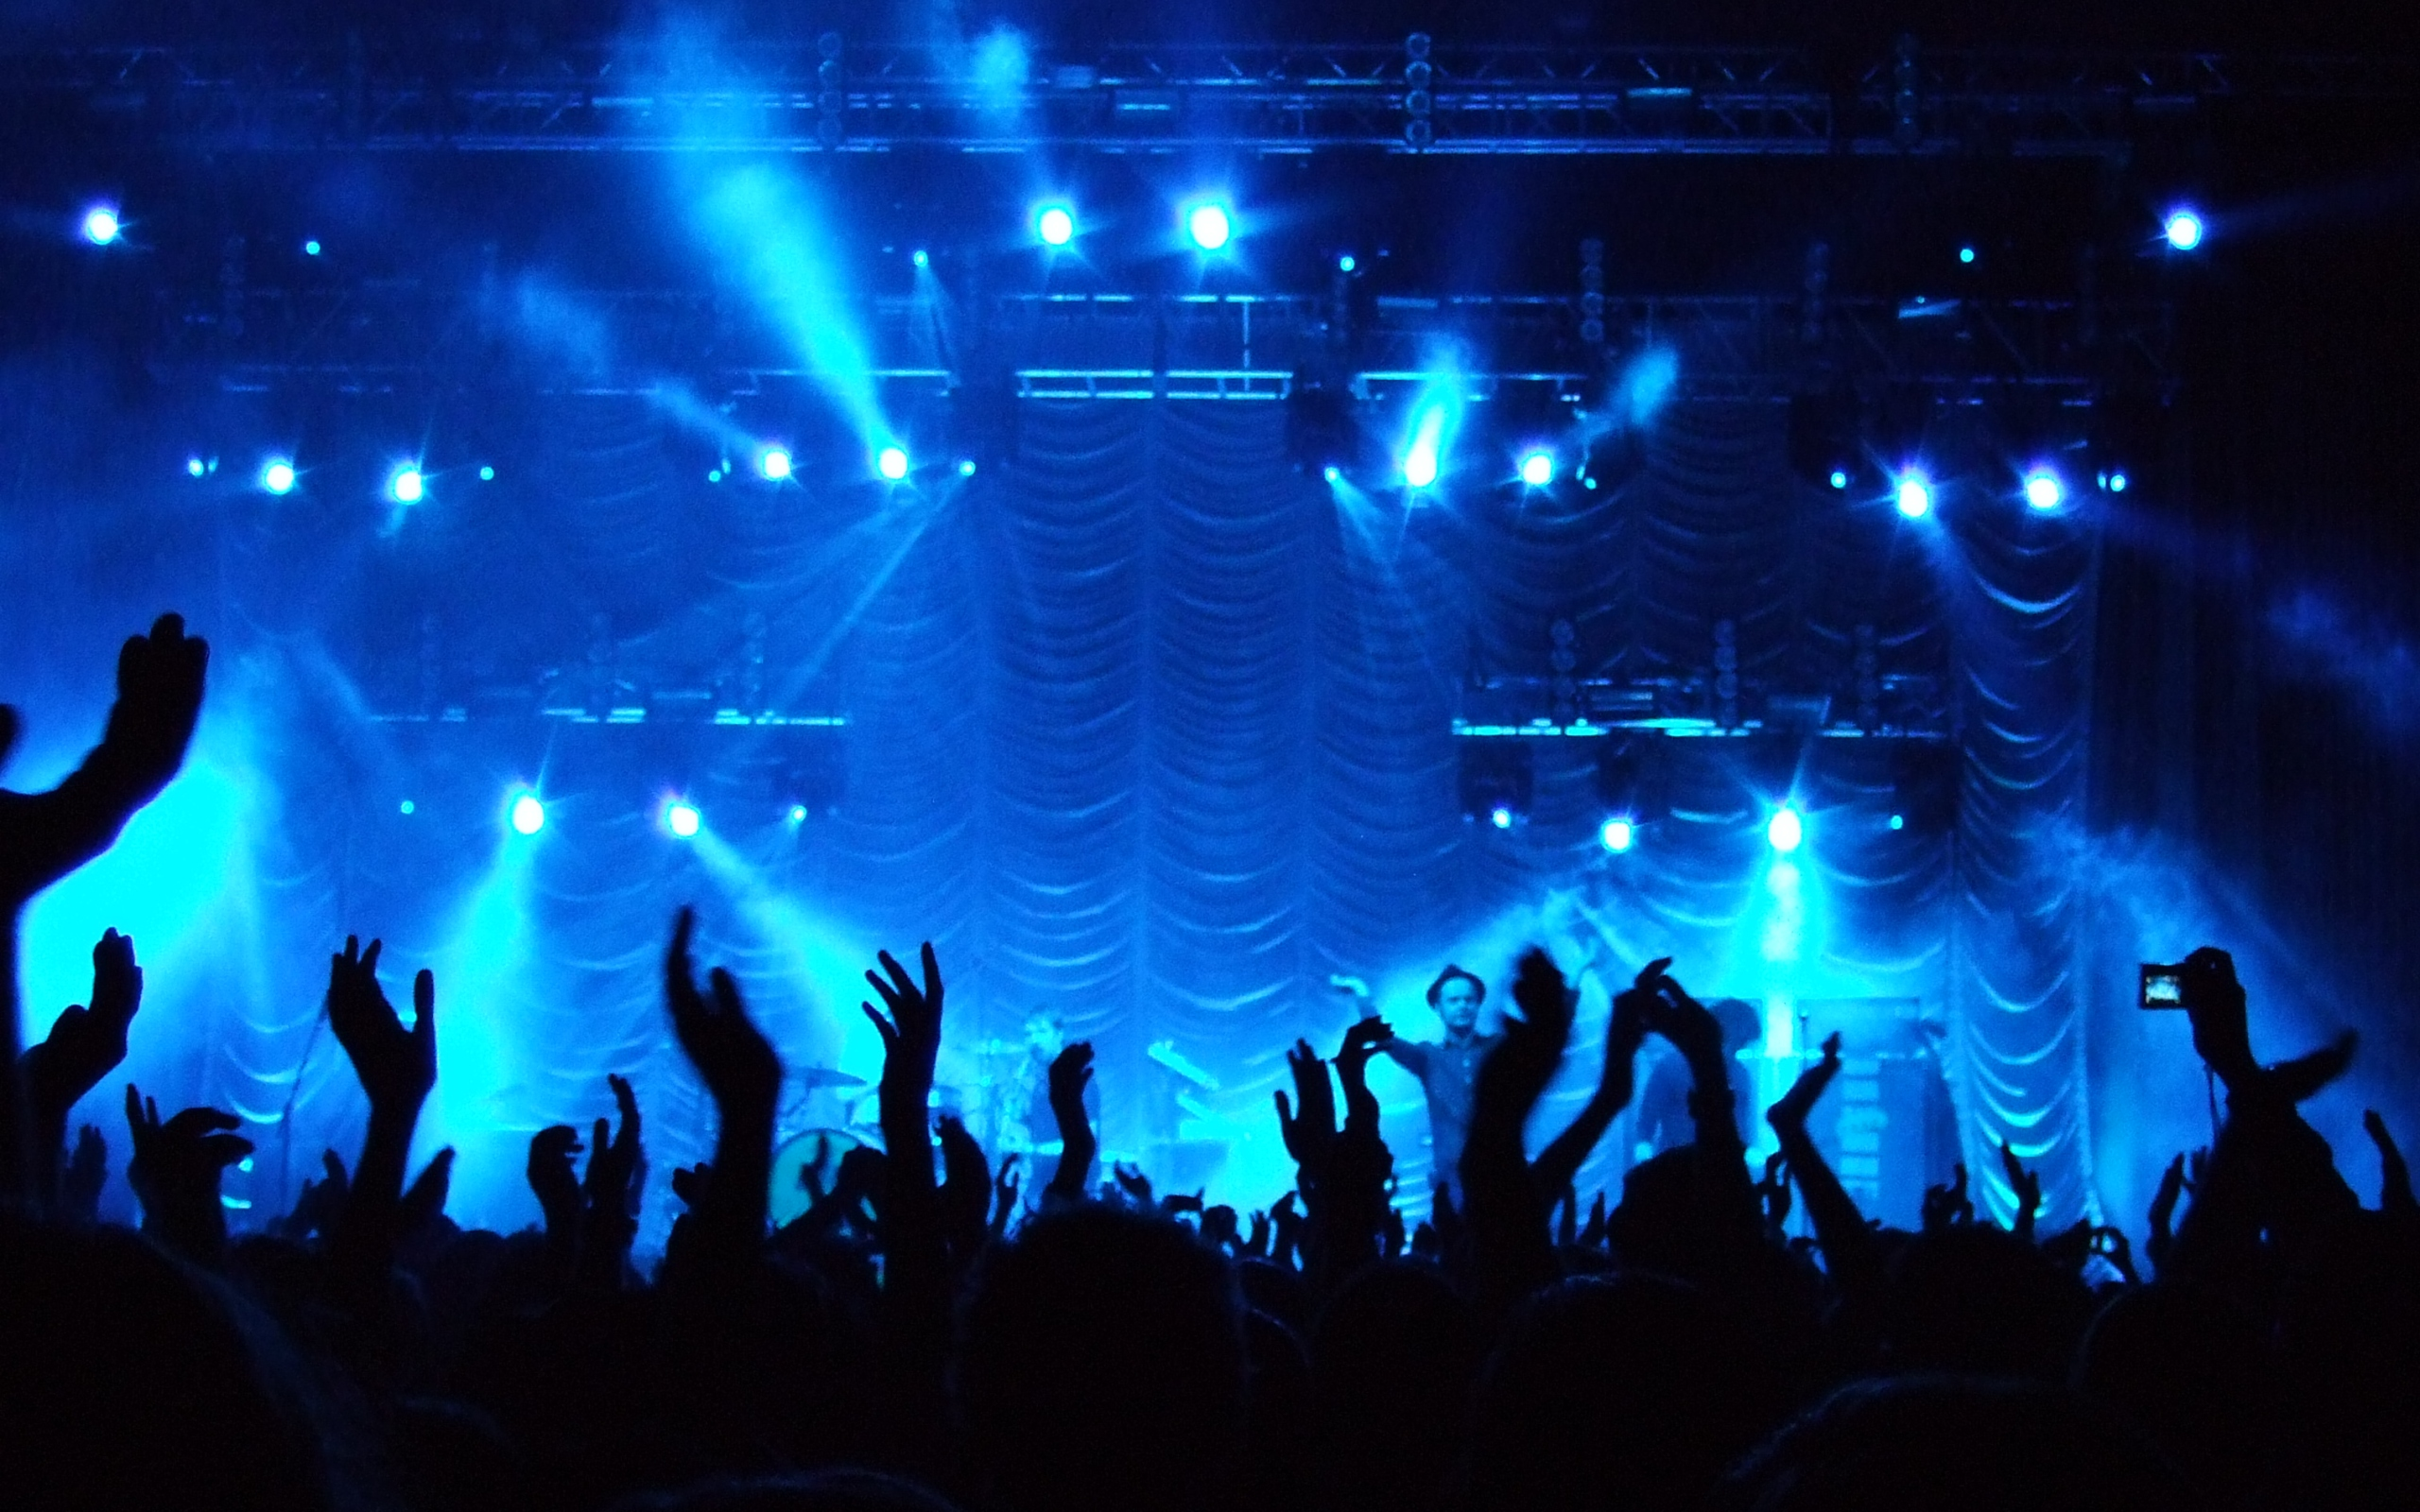 https://torontette.files.wordpress.com/2011/03/20090702-feedmewp-concert.jpg